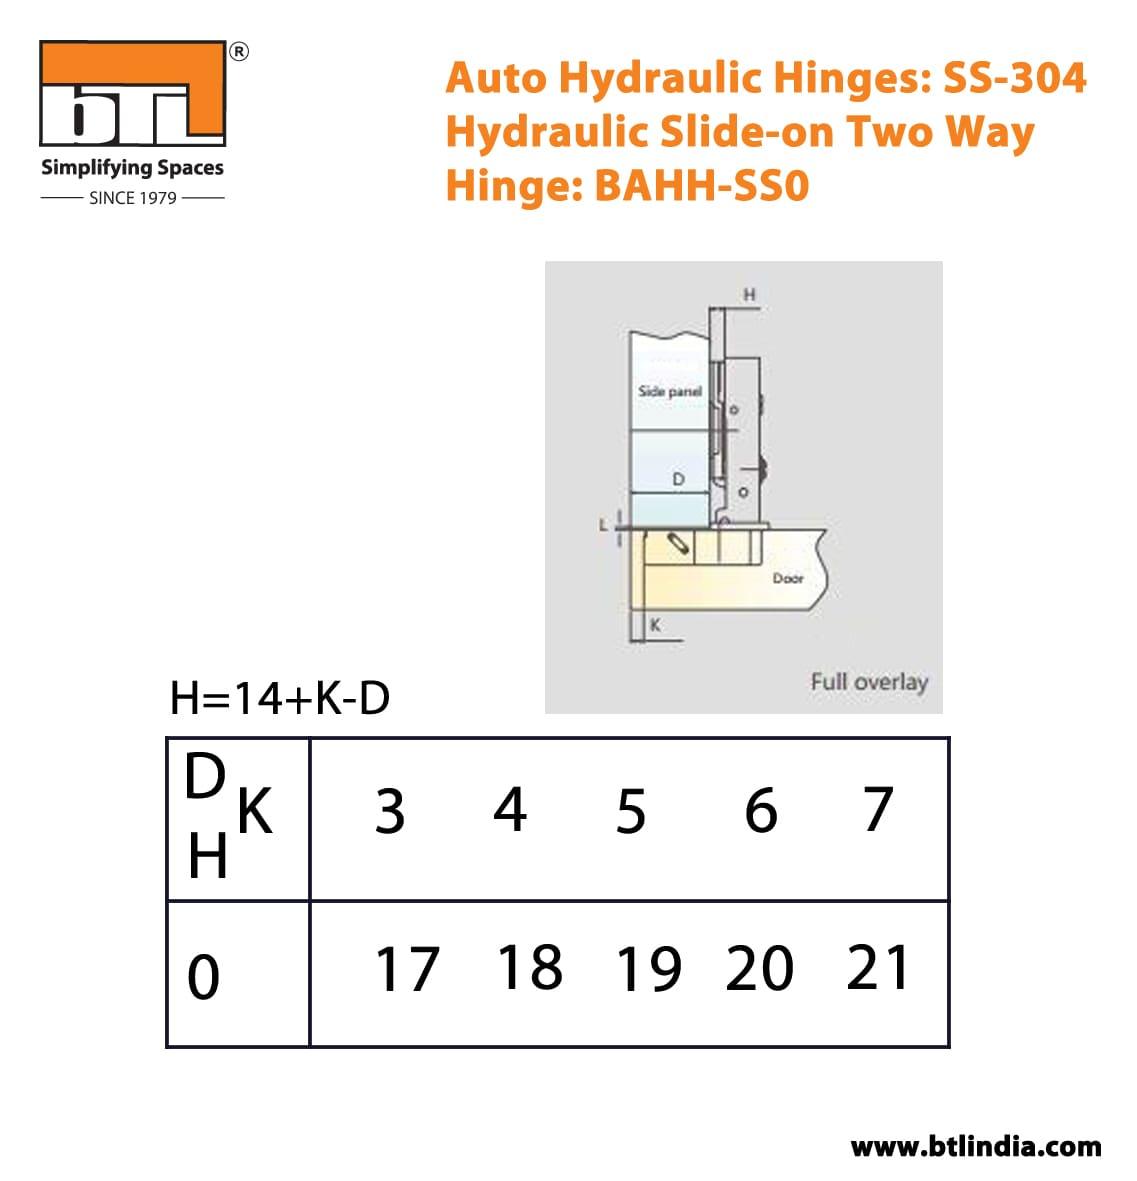 BTL Auto Hydraulic Hinge: SS 304 Hydraulic Slide-on One Way Hinge - BAHH-SS0 - Full Overlay